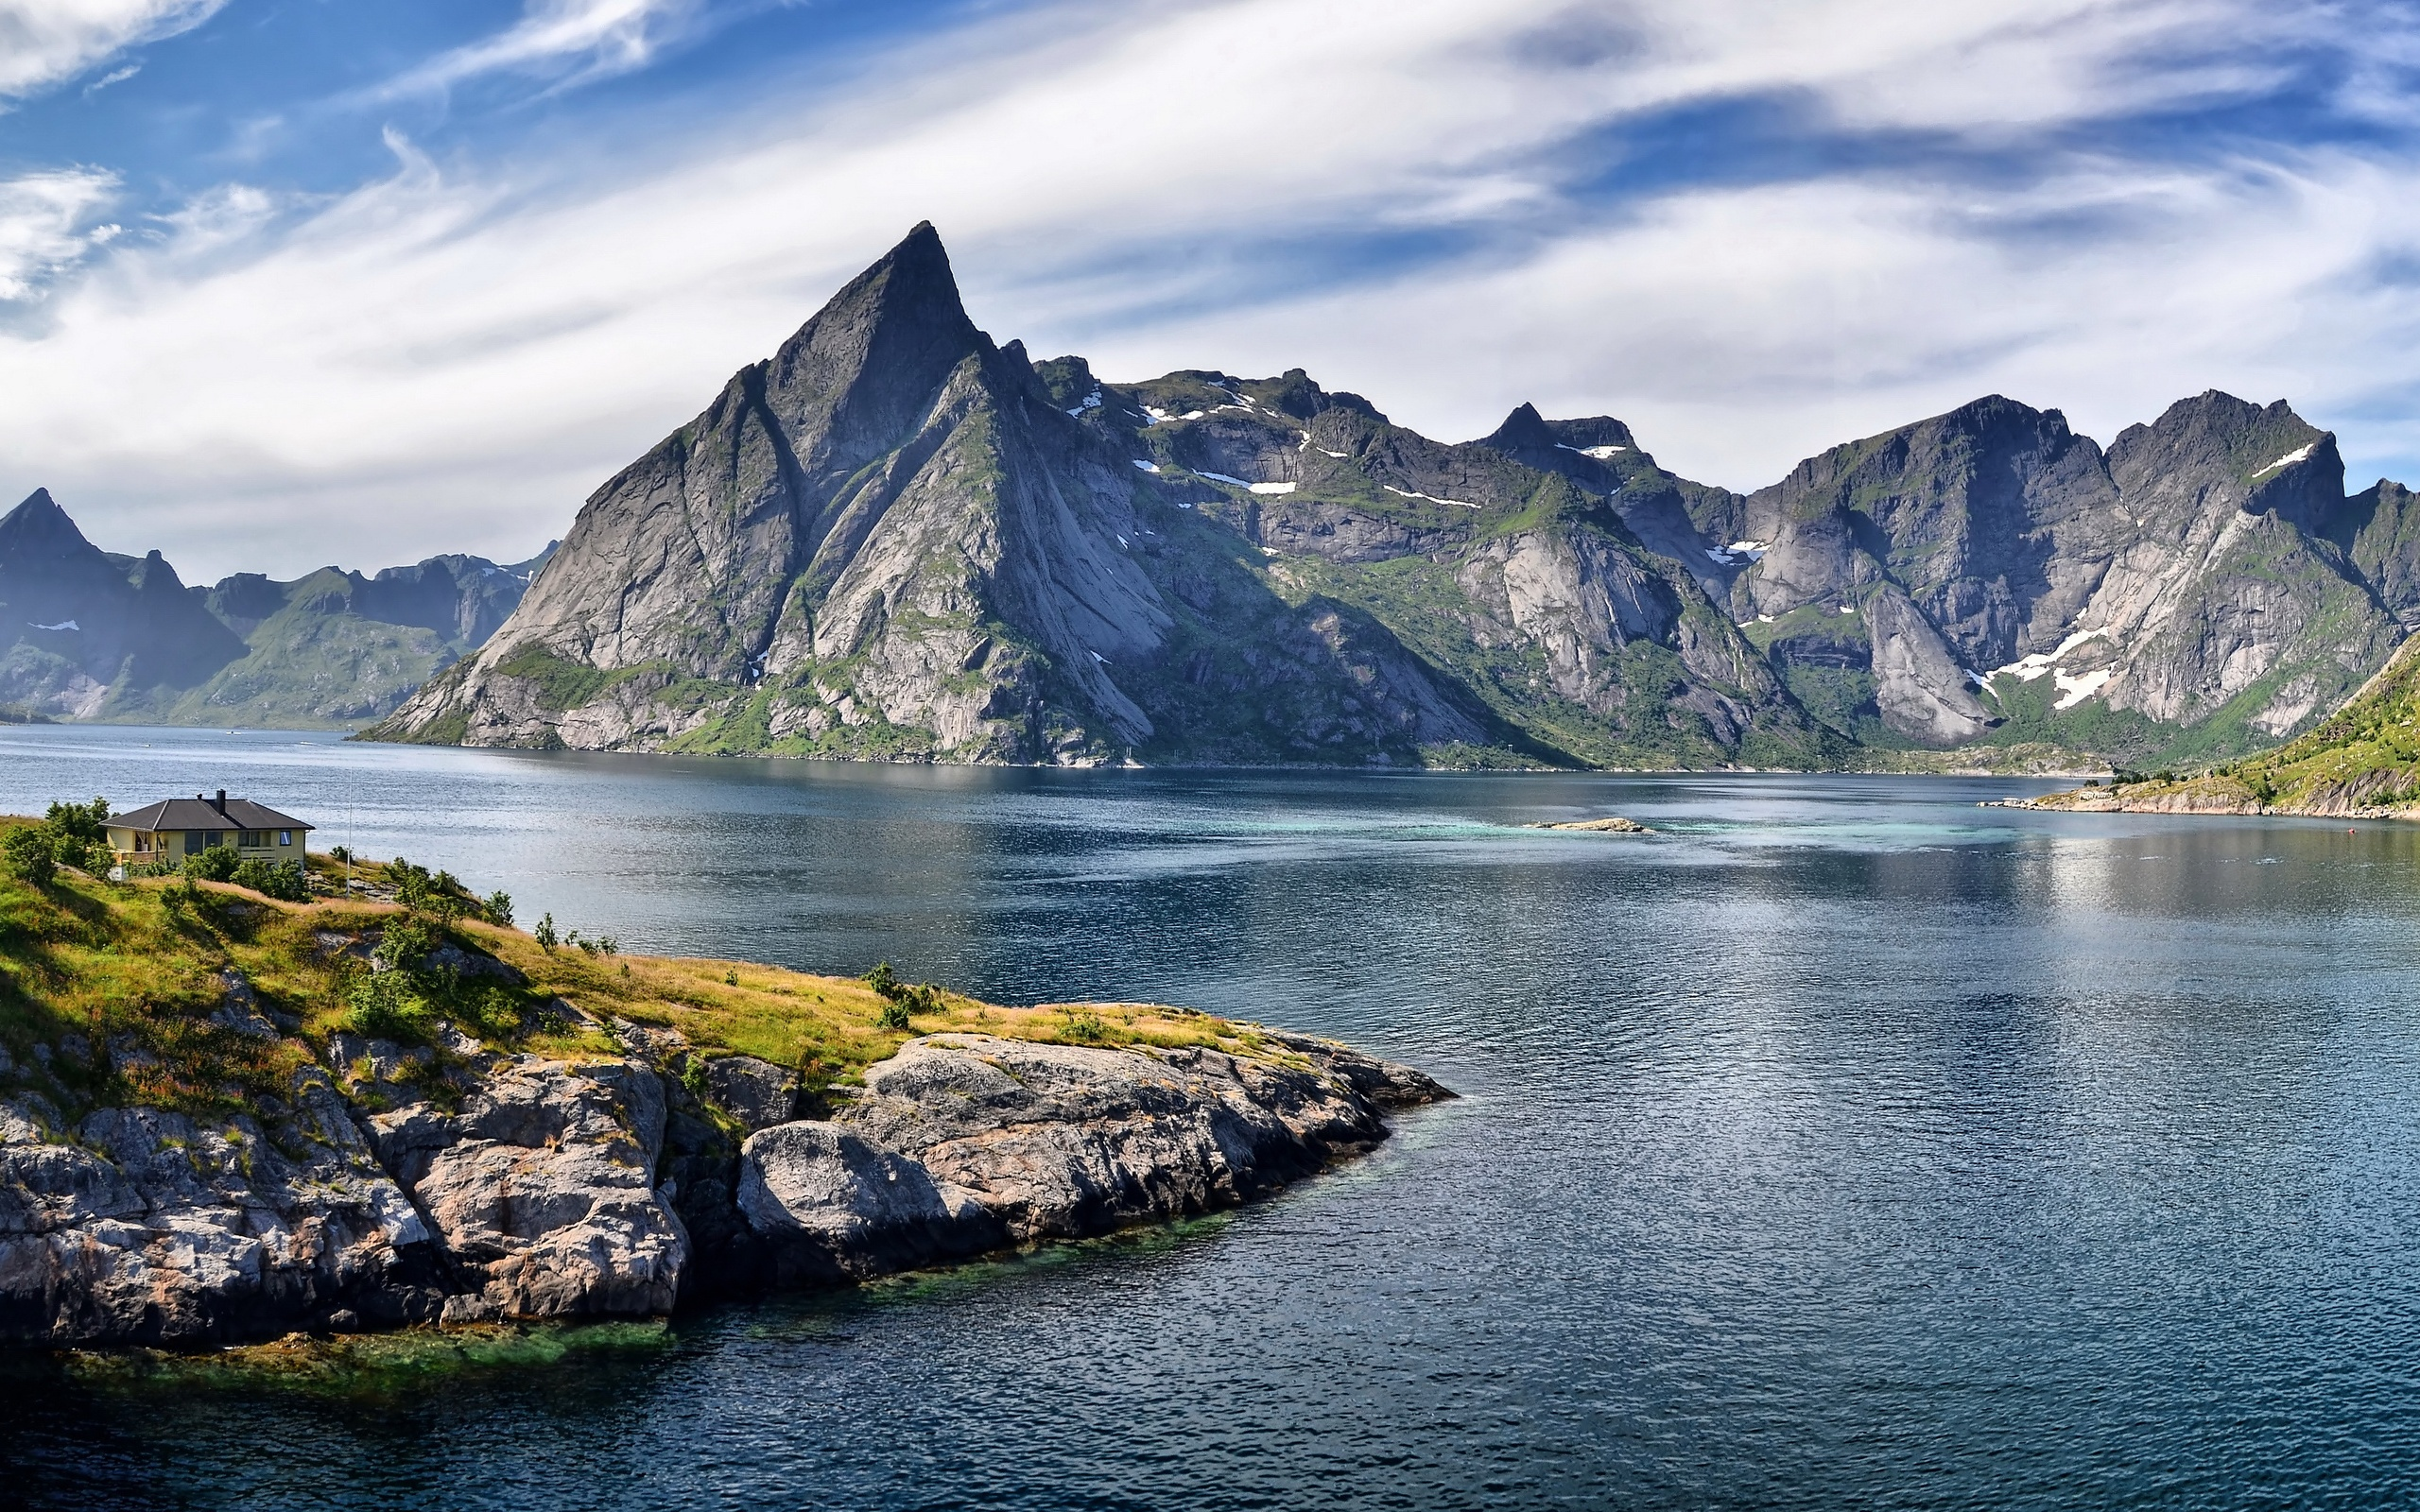 Beautiful Mountains Lake Wallpapers   2560x1600   2049891 2560x1600